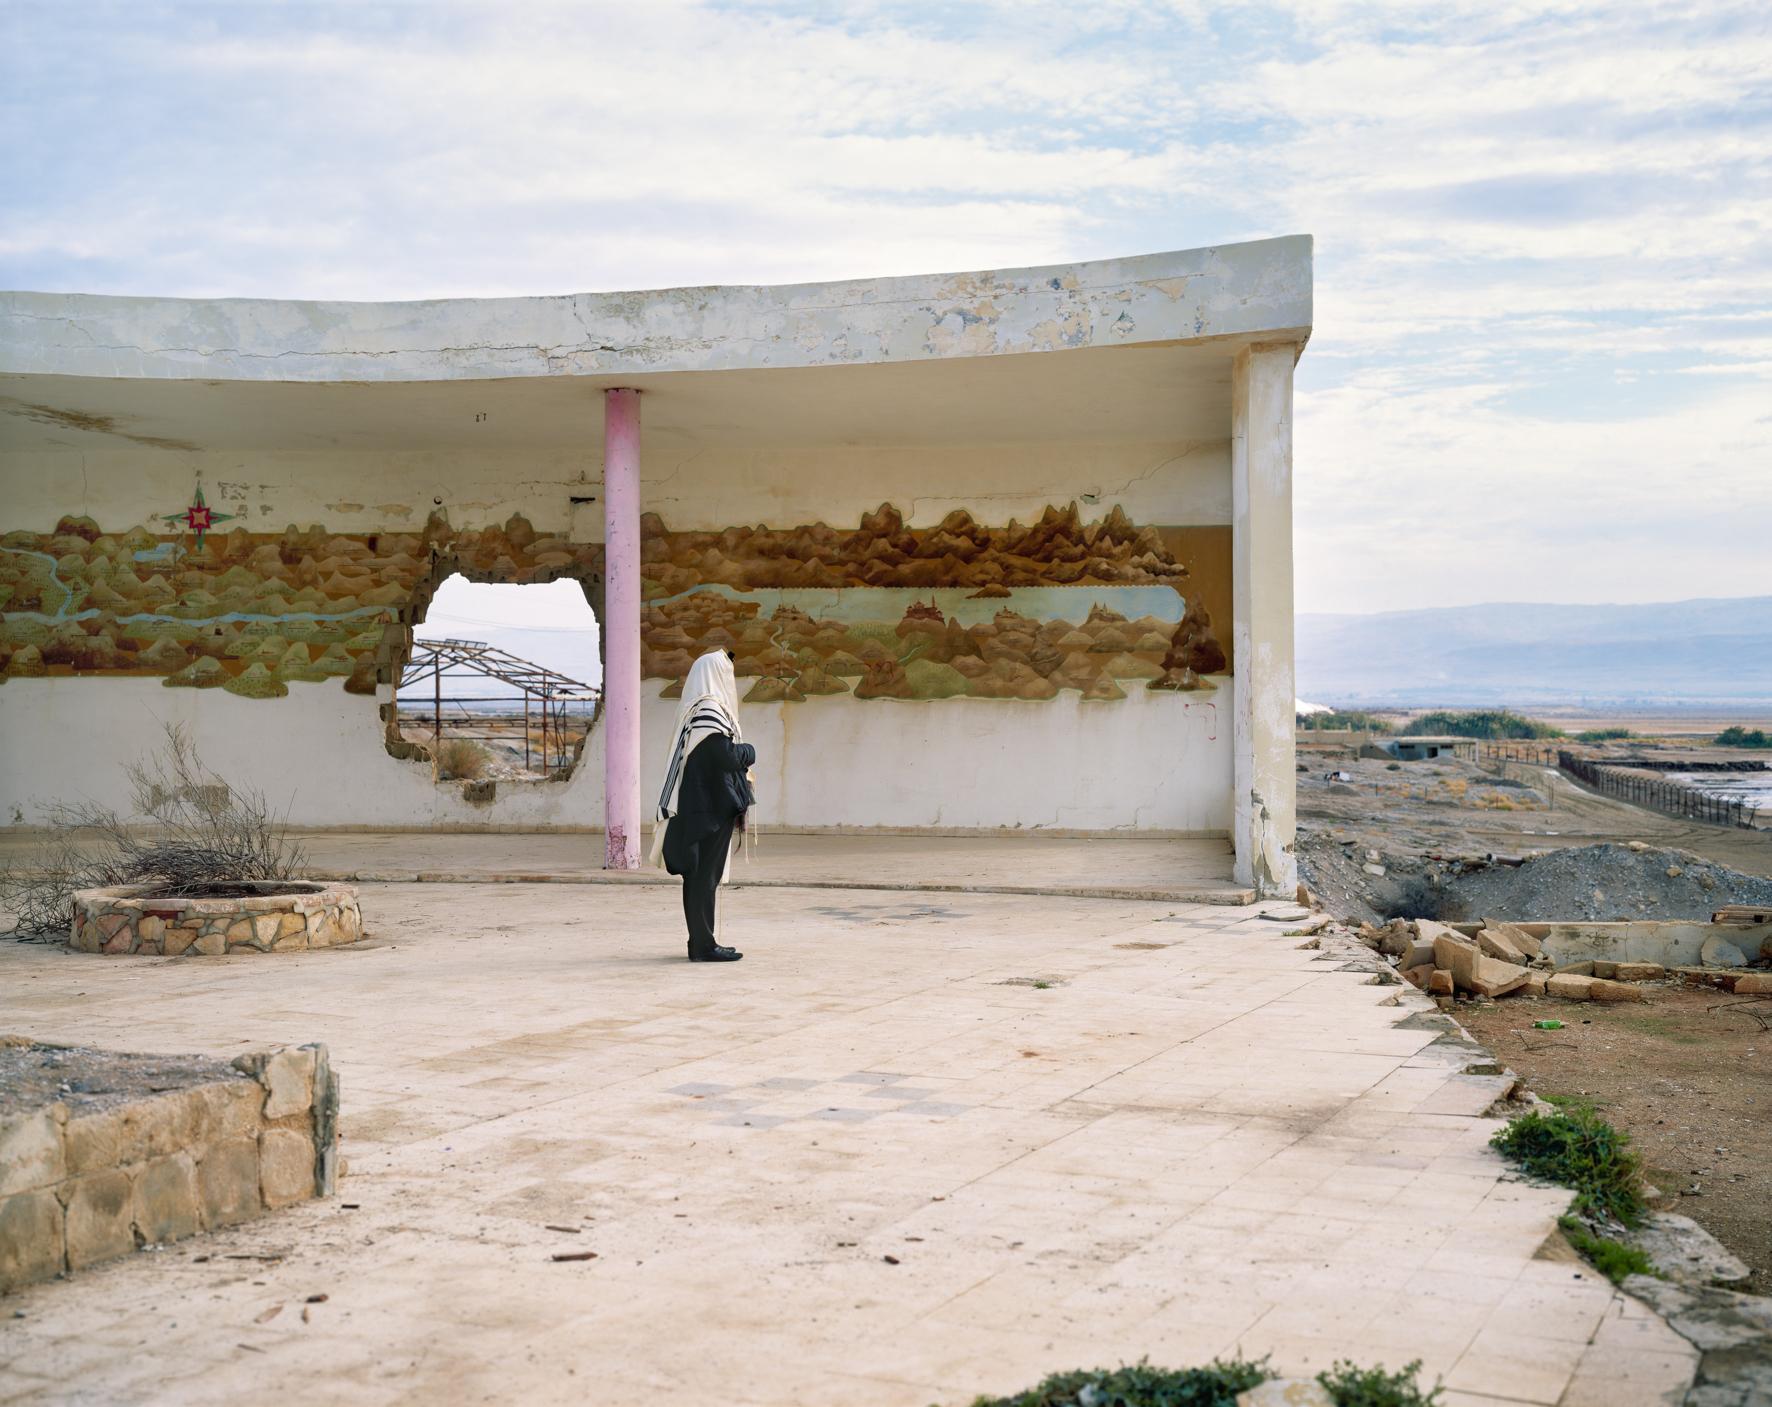 Morning Prayer, The Dead Sea Hilton, 2006. © Yaakov Israel